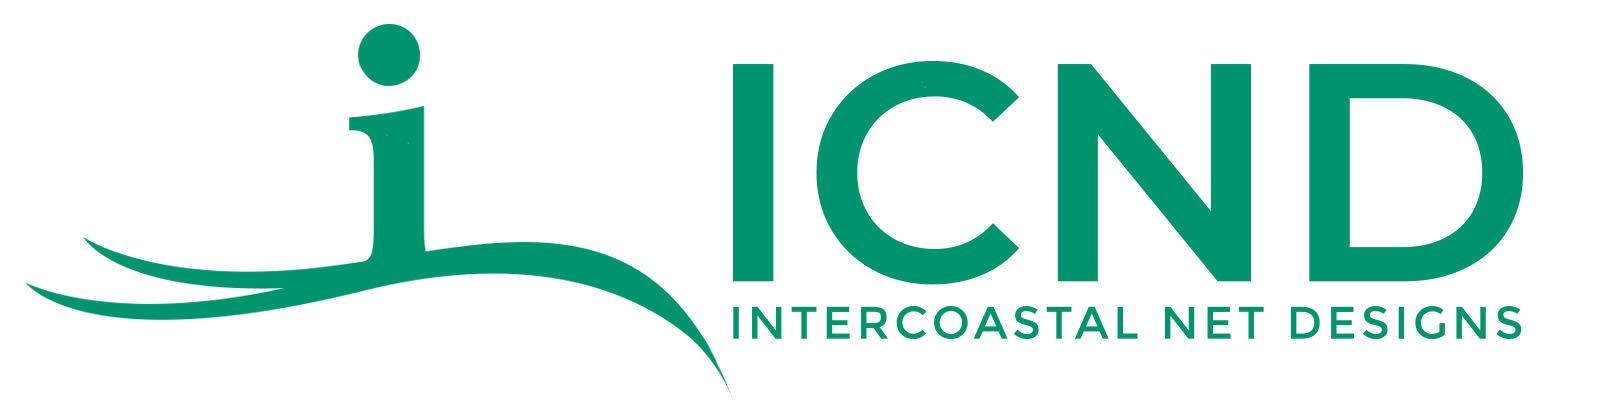 INCD logo banner